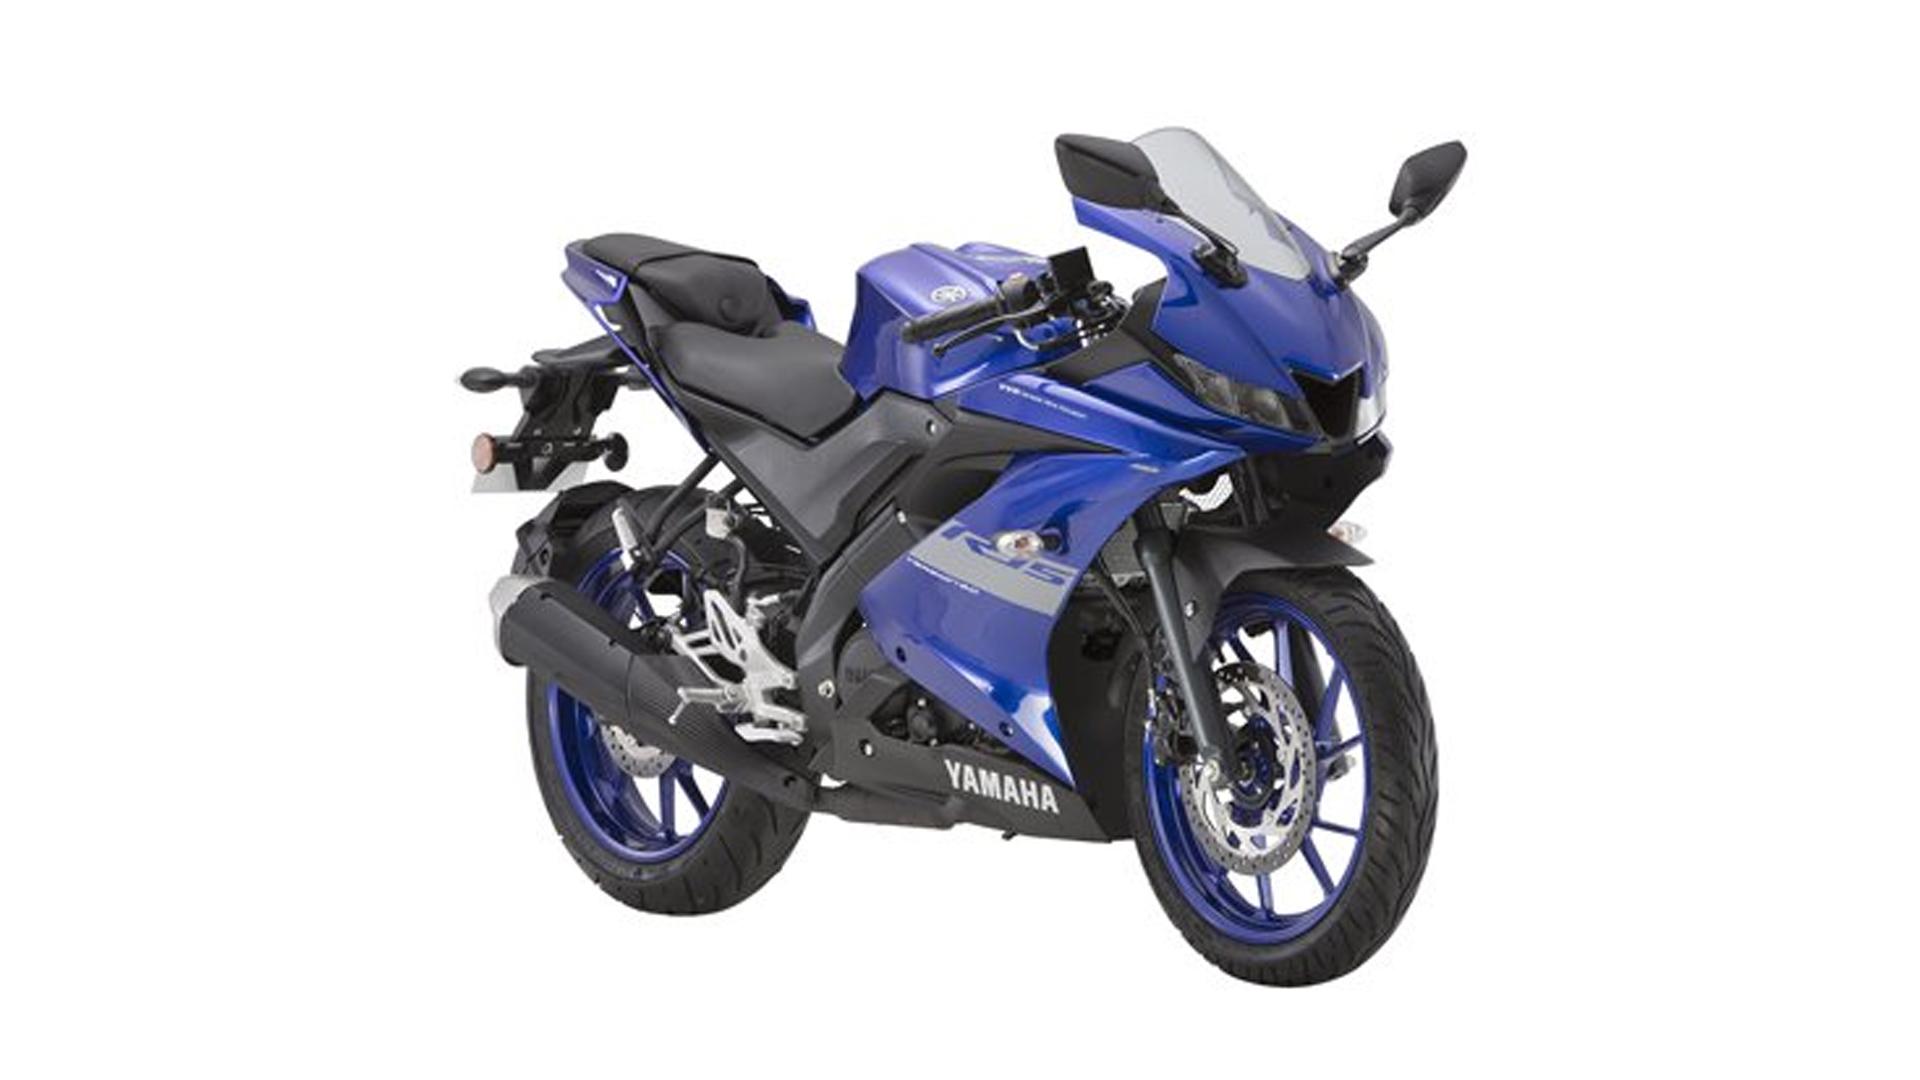 Yamaha YZF-R15 V3.0 2020 Racing Blue